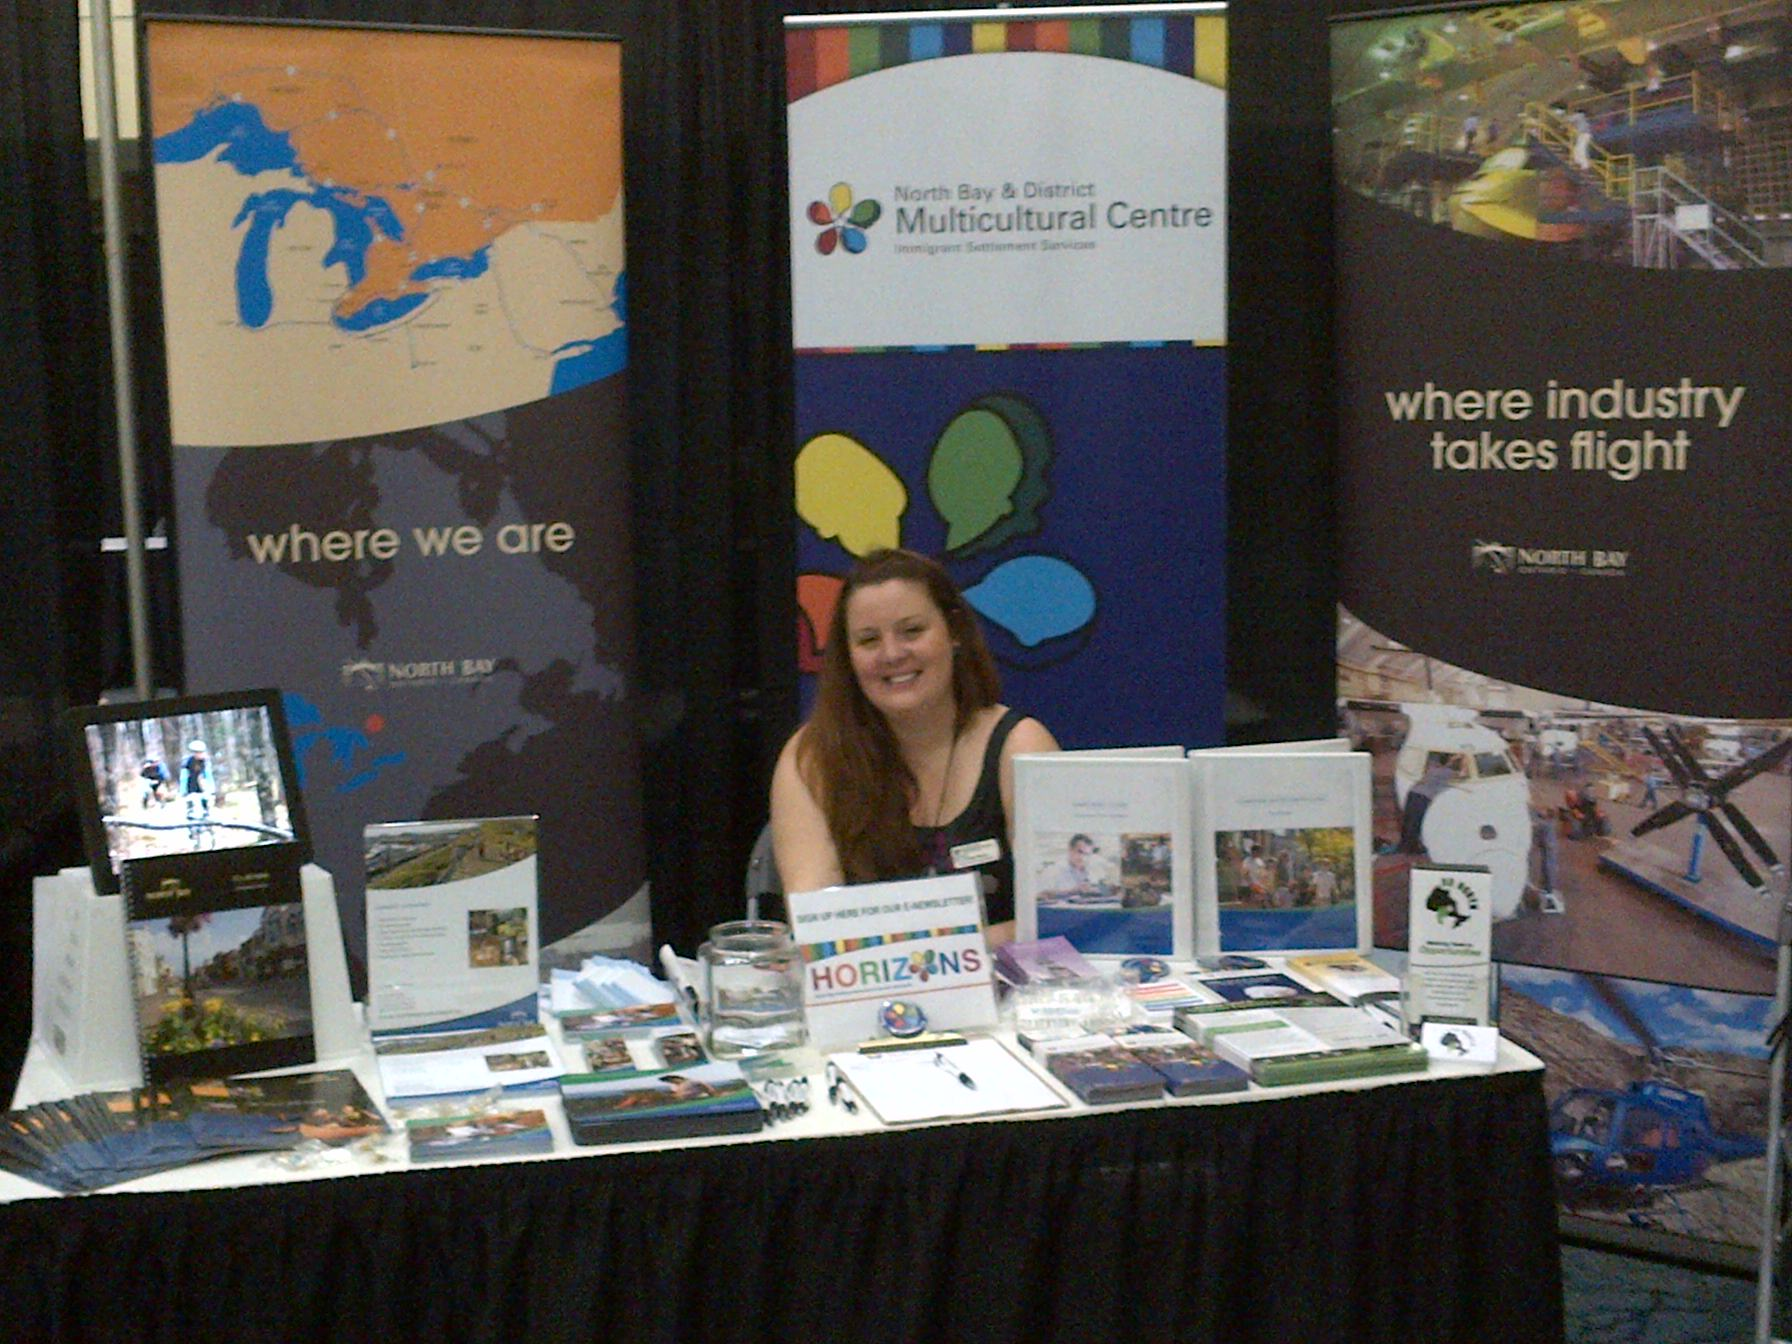 IEP Conference, Toronto